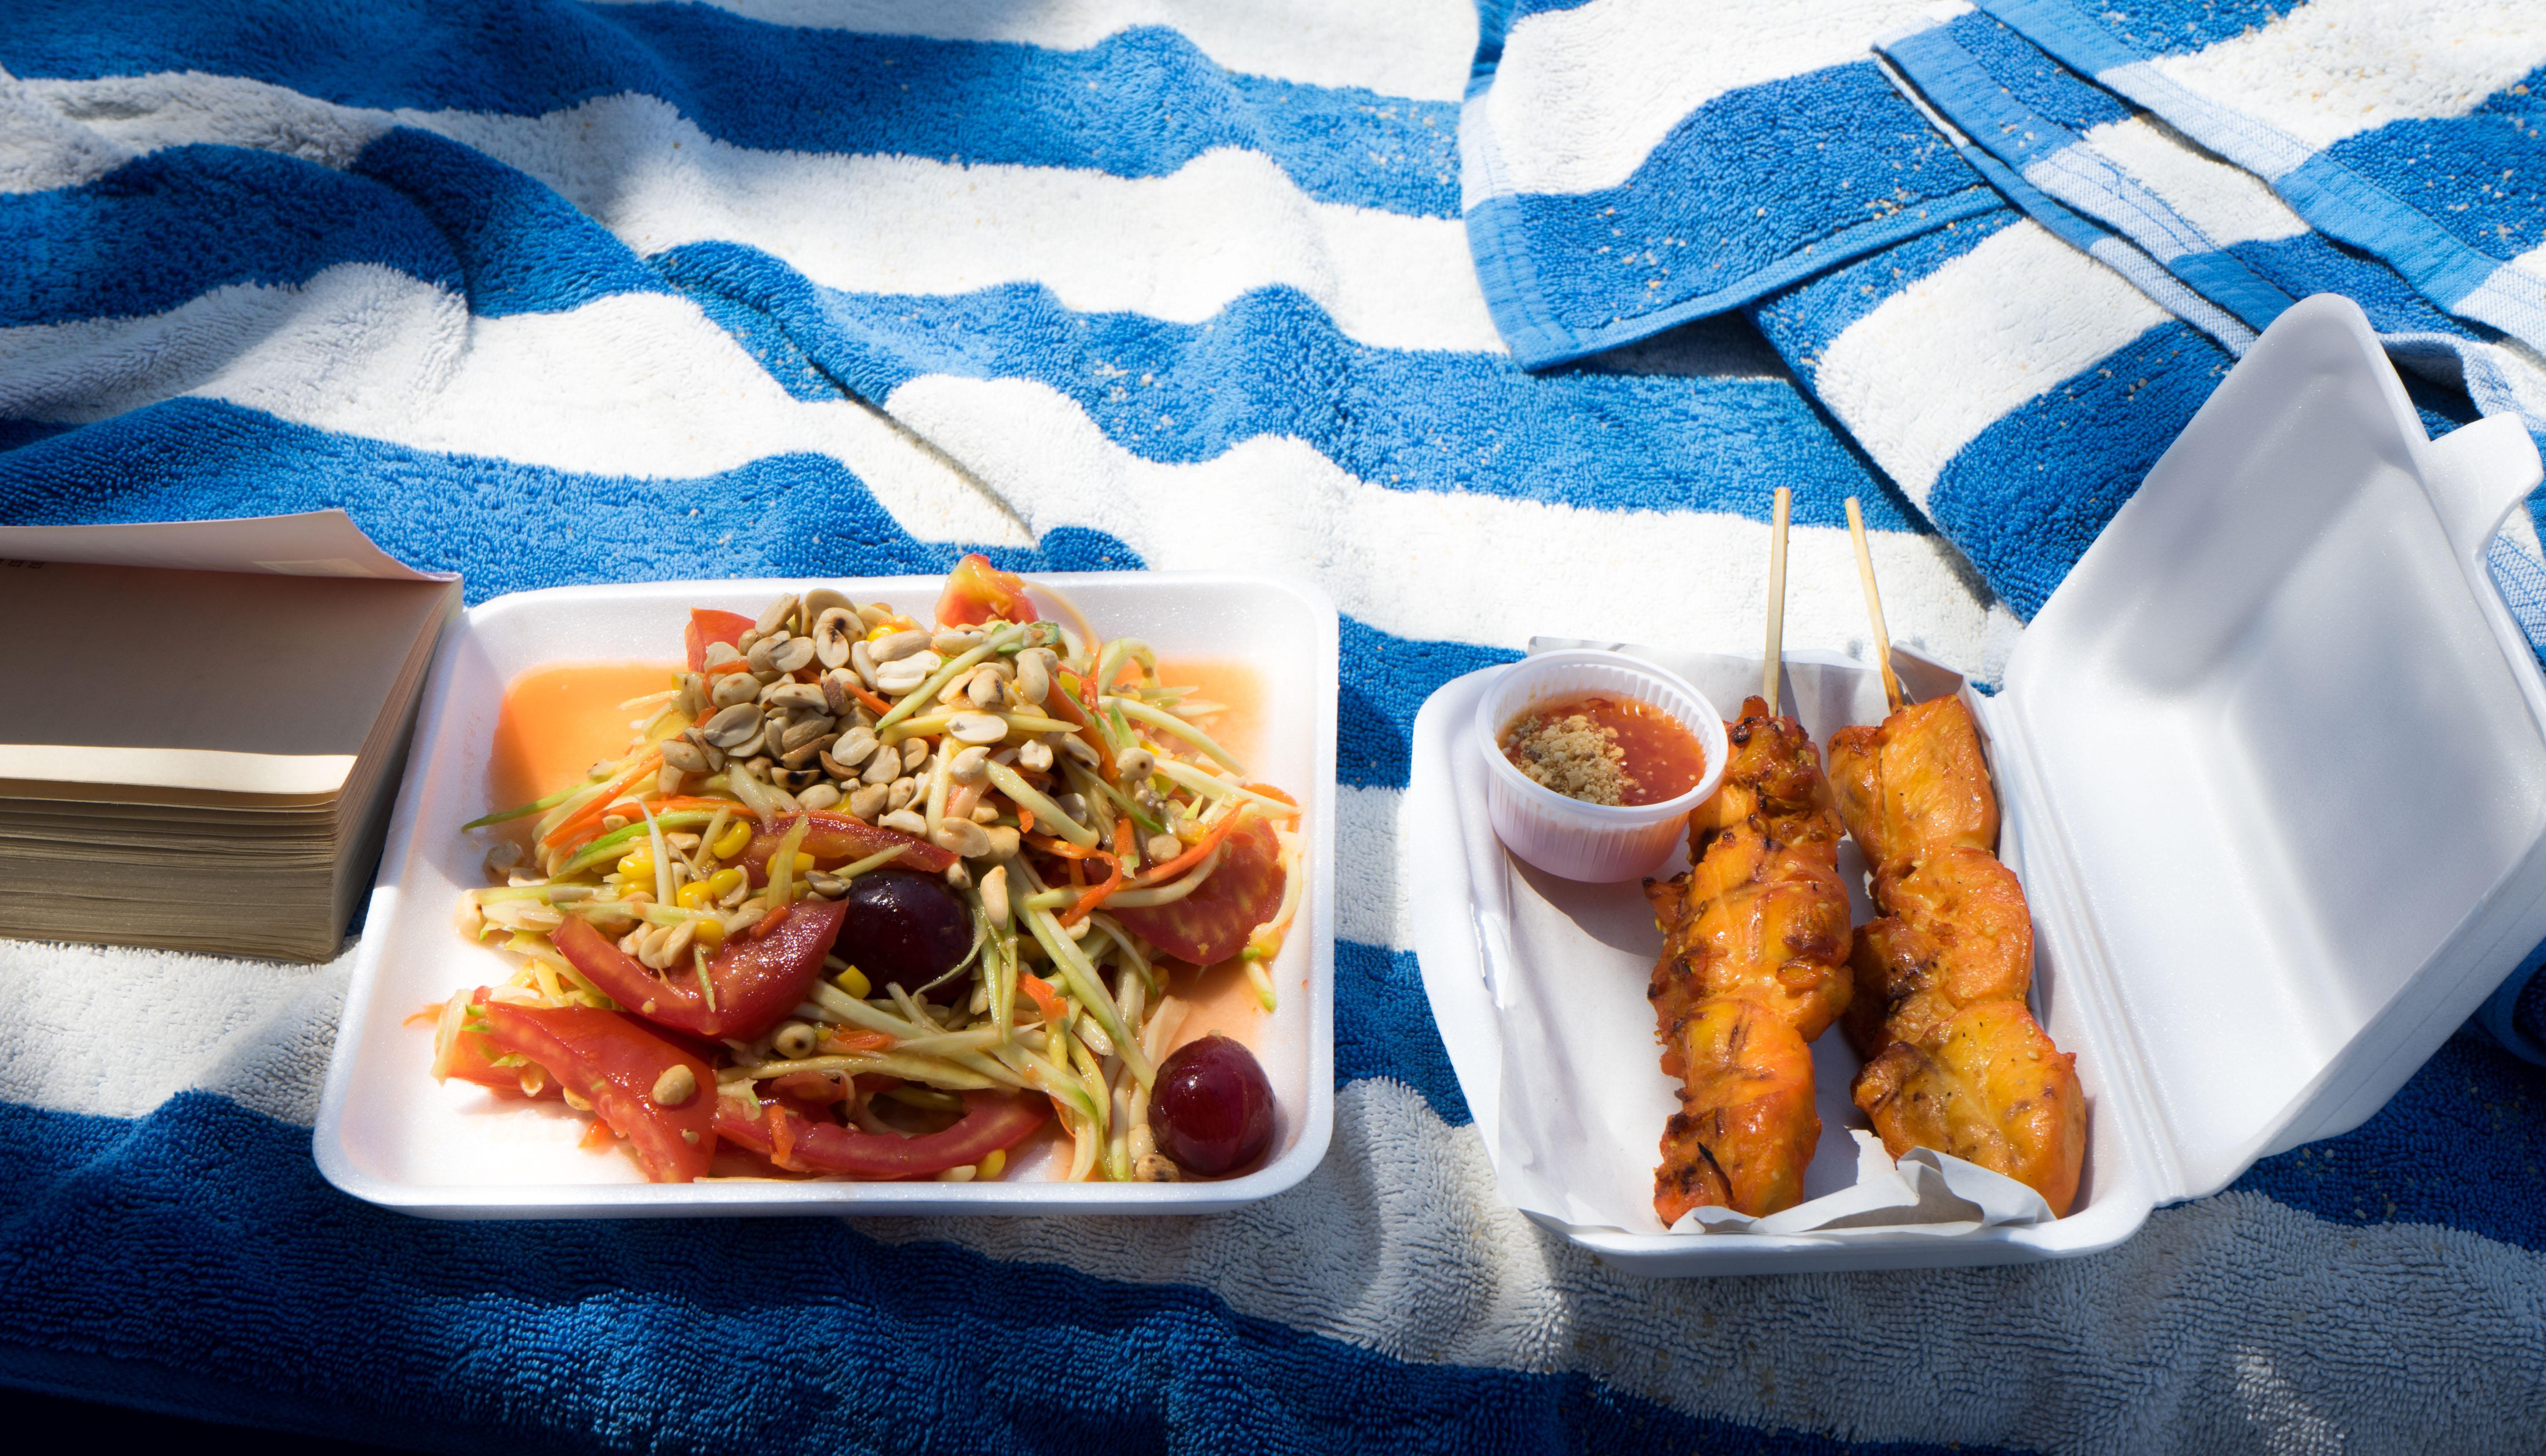 Beach lunch KS